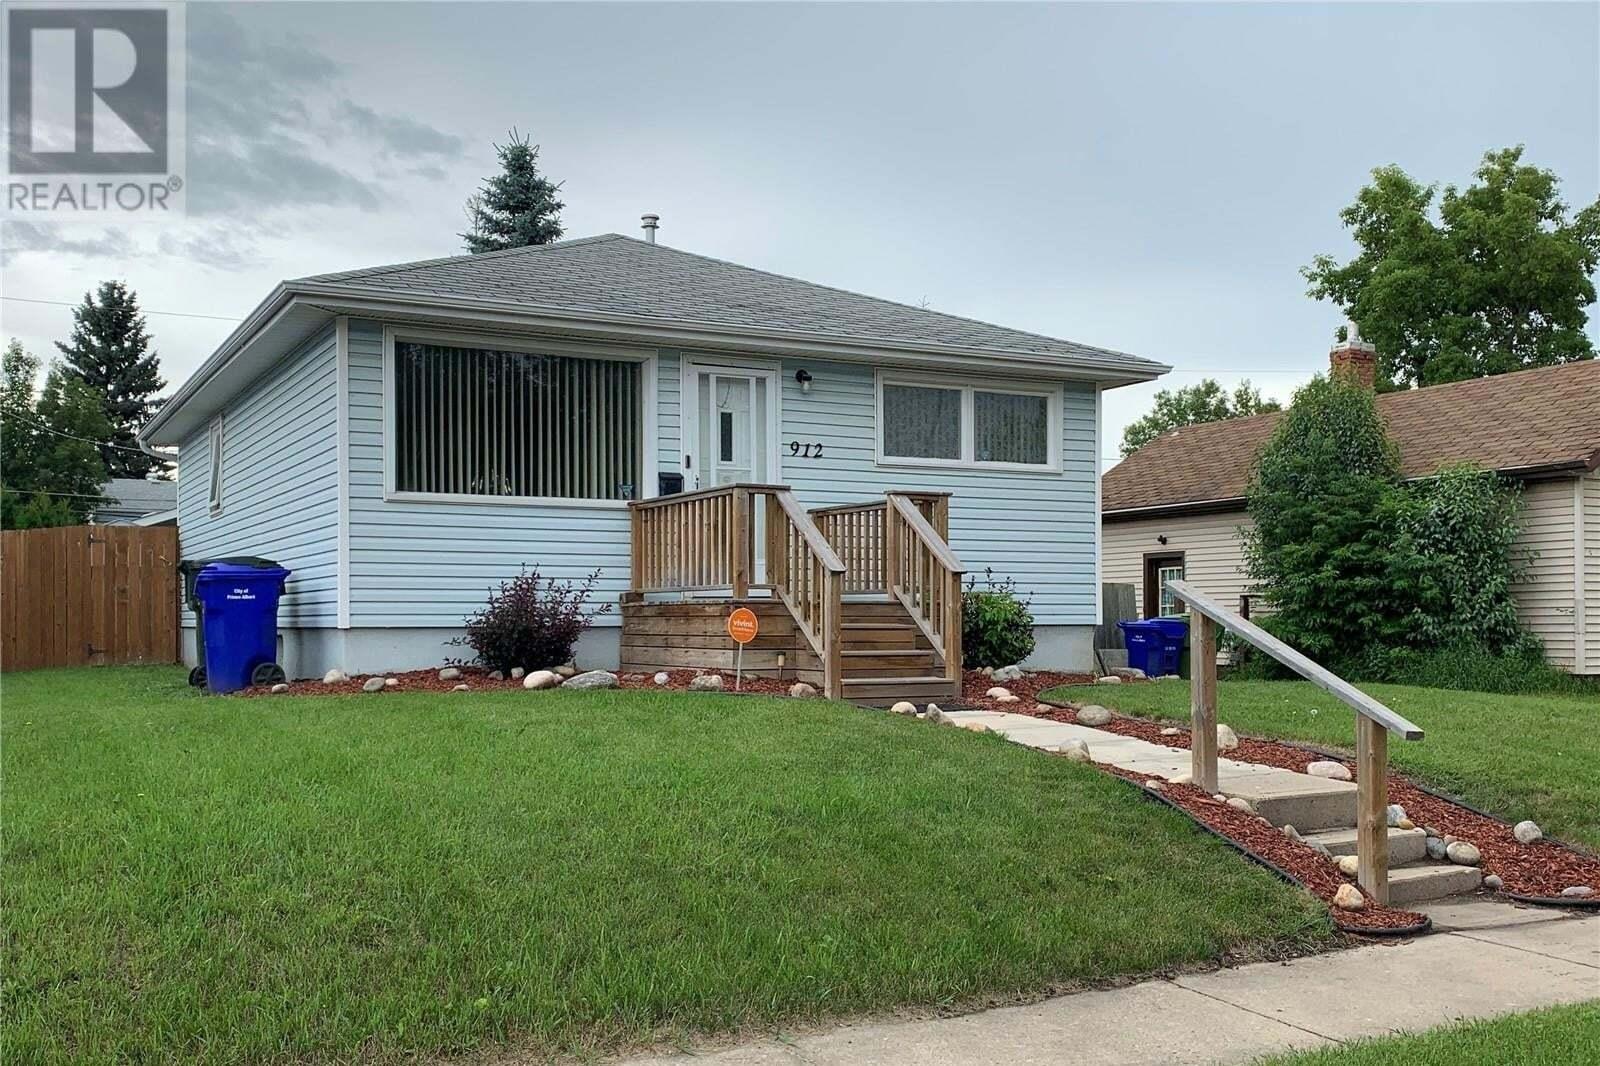 House for sale at 912 4th St E Prince Albert Saskatchewan - MLS: SK817296